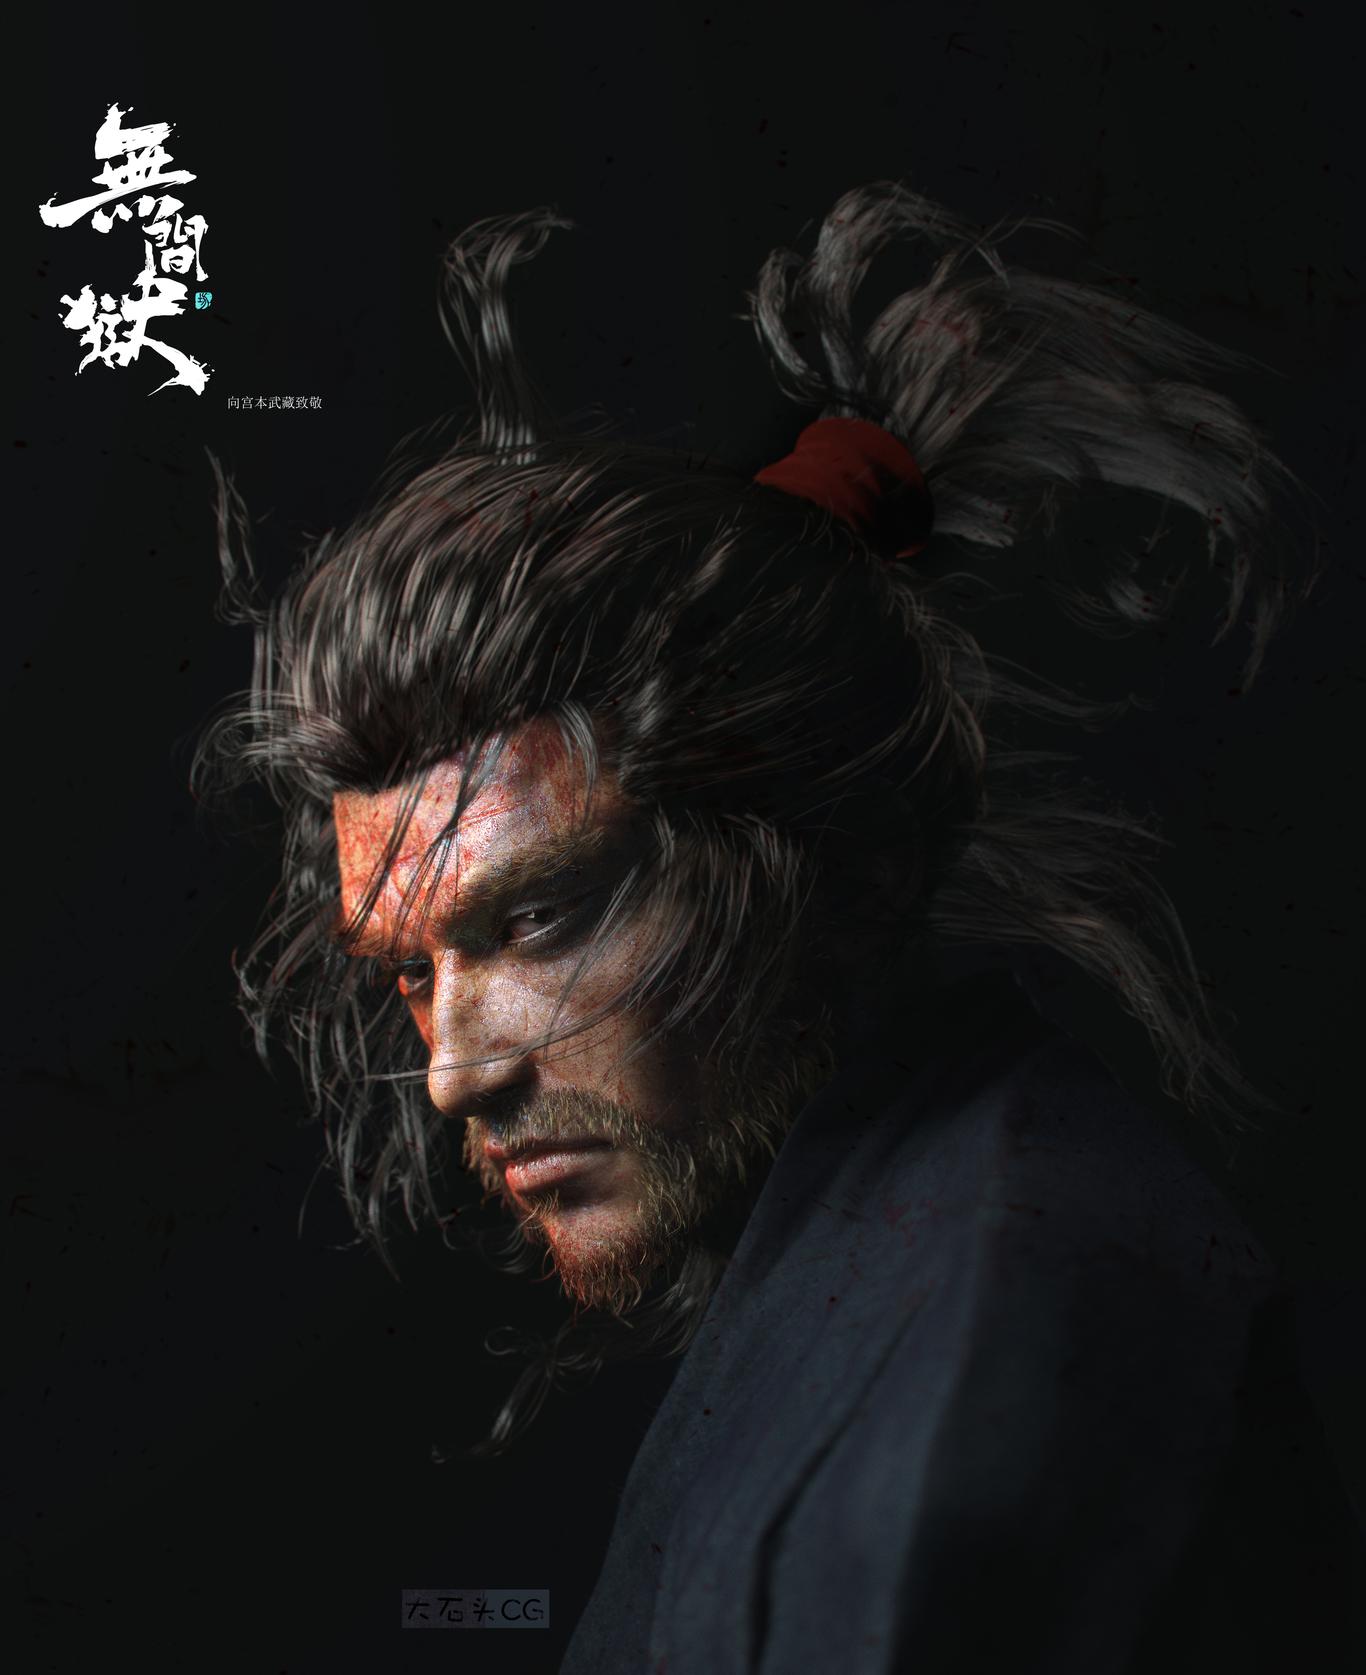 The Samurai By Fourrock Character Art 3d Cgsociety